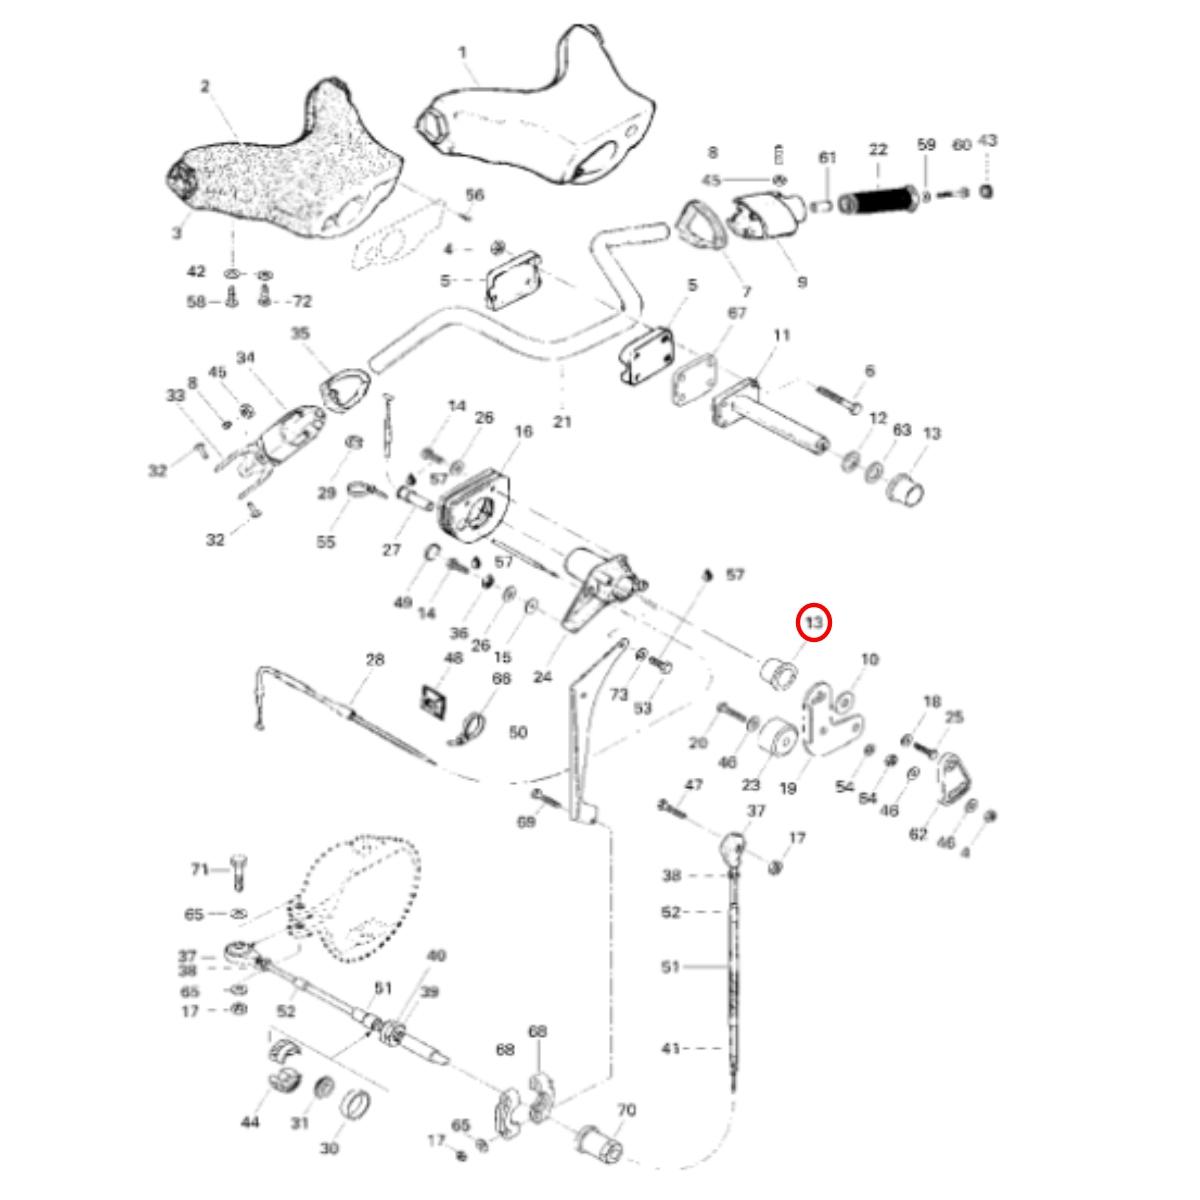 Bucha Guidão Jet Ski Sea Doo GT/SP/GTI/GTS  - Radical Peças - Peças para Jet Ski